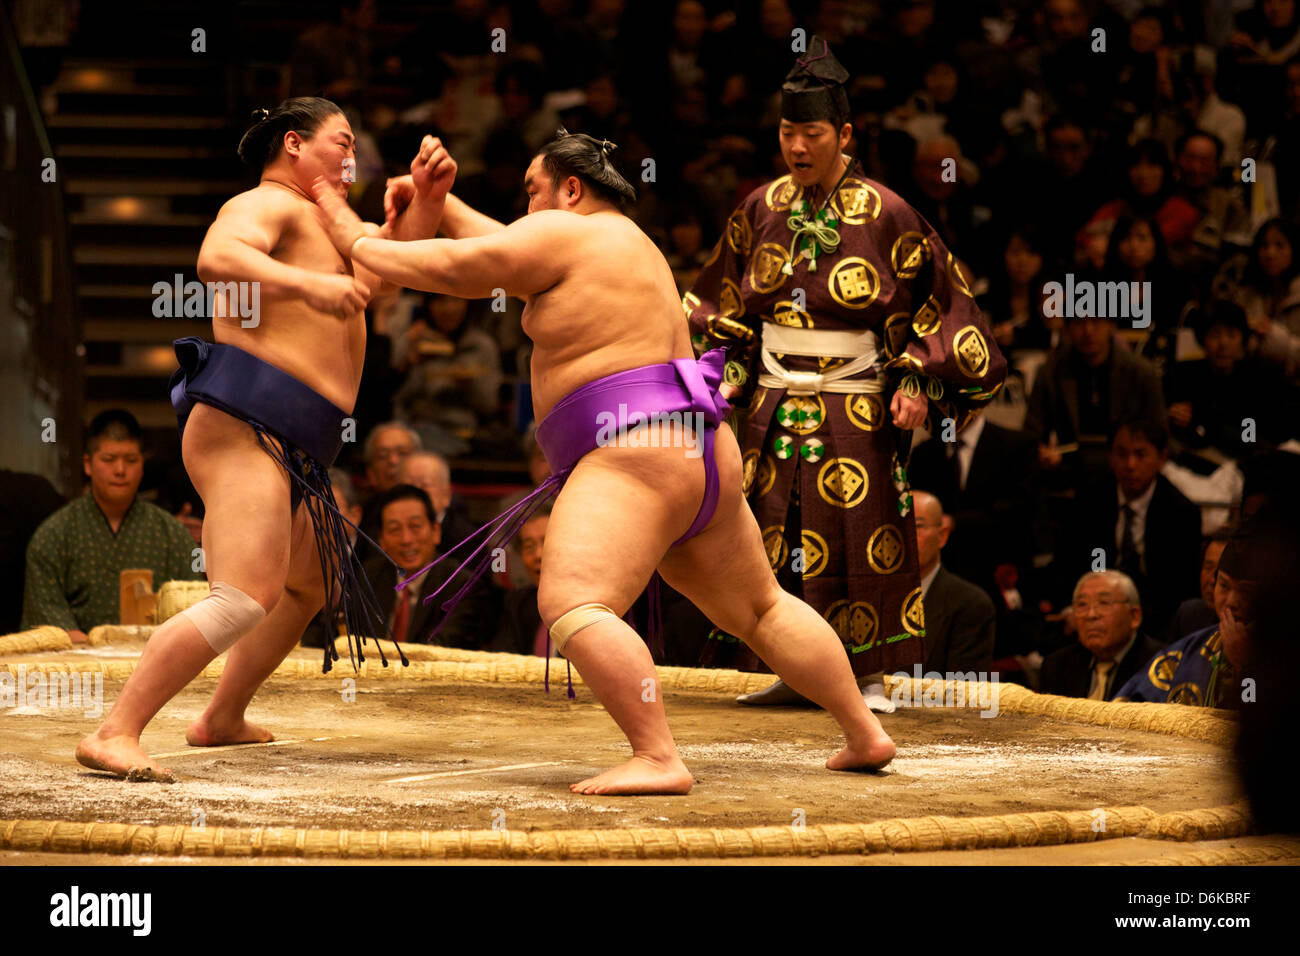 Sumo-Ringen Wettbewerb auf der Kokugikan Stadion, Tokio, Japan, Asia Stockbild